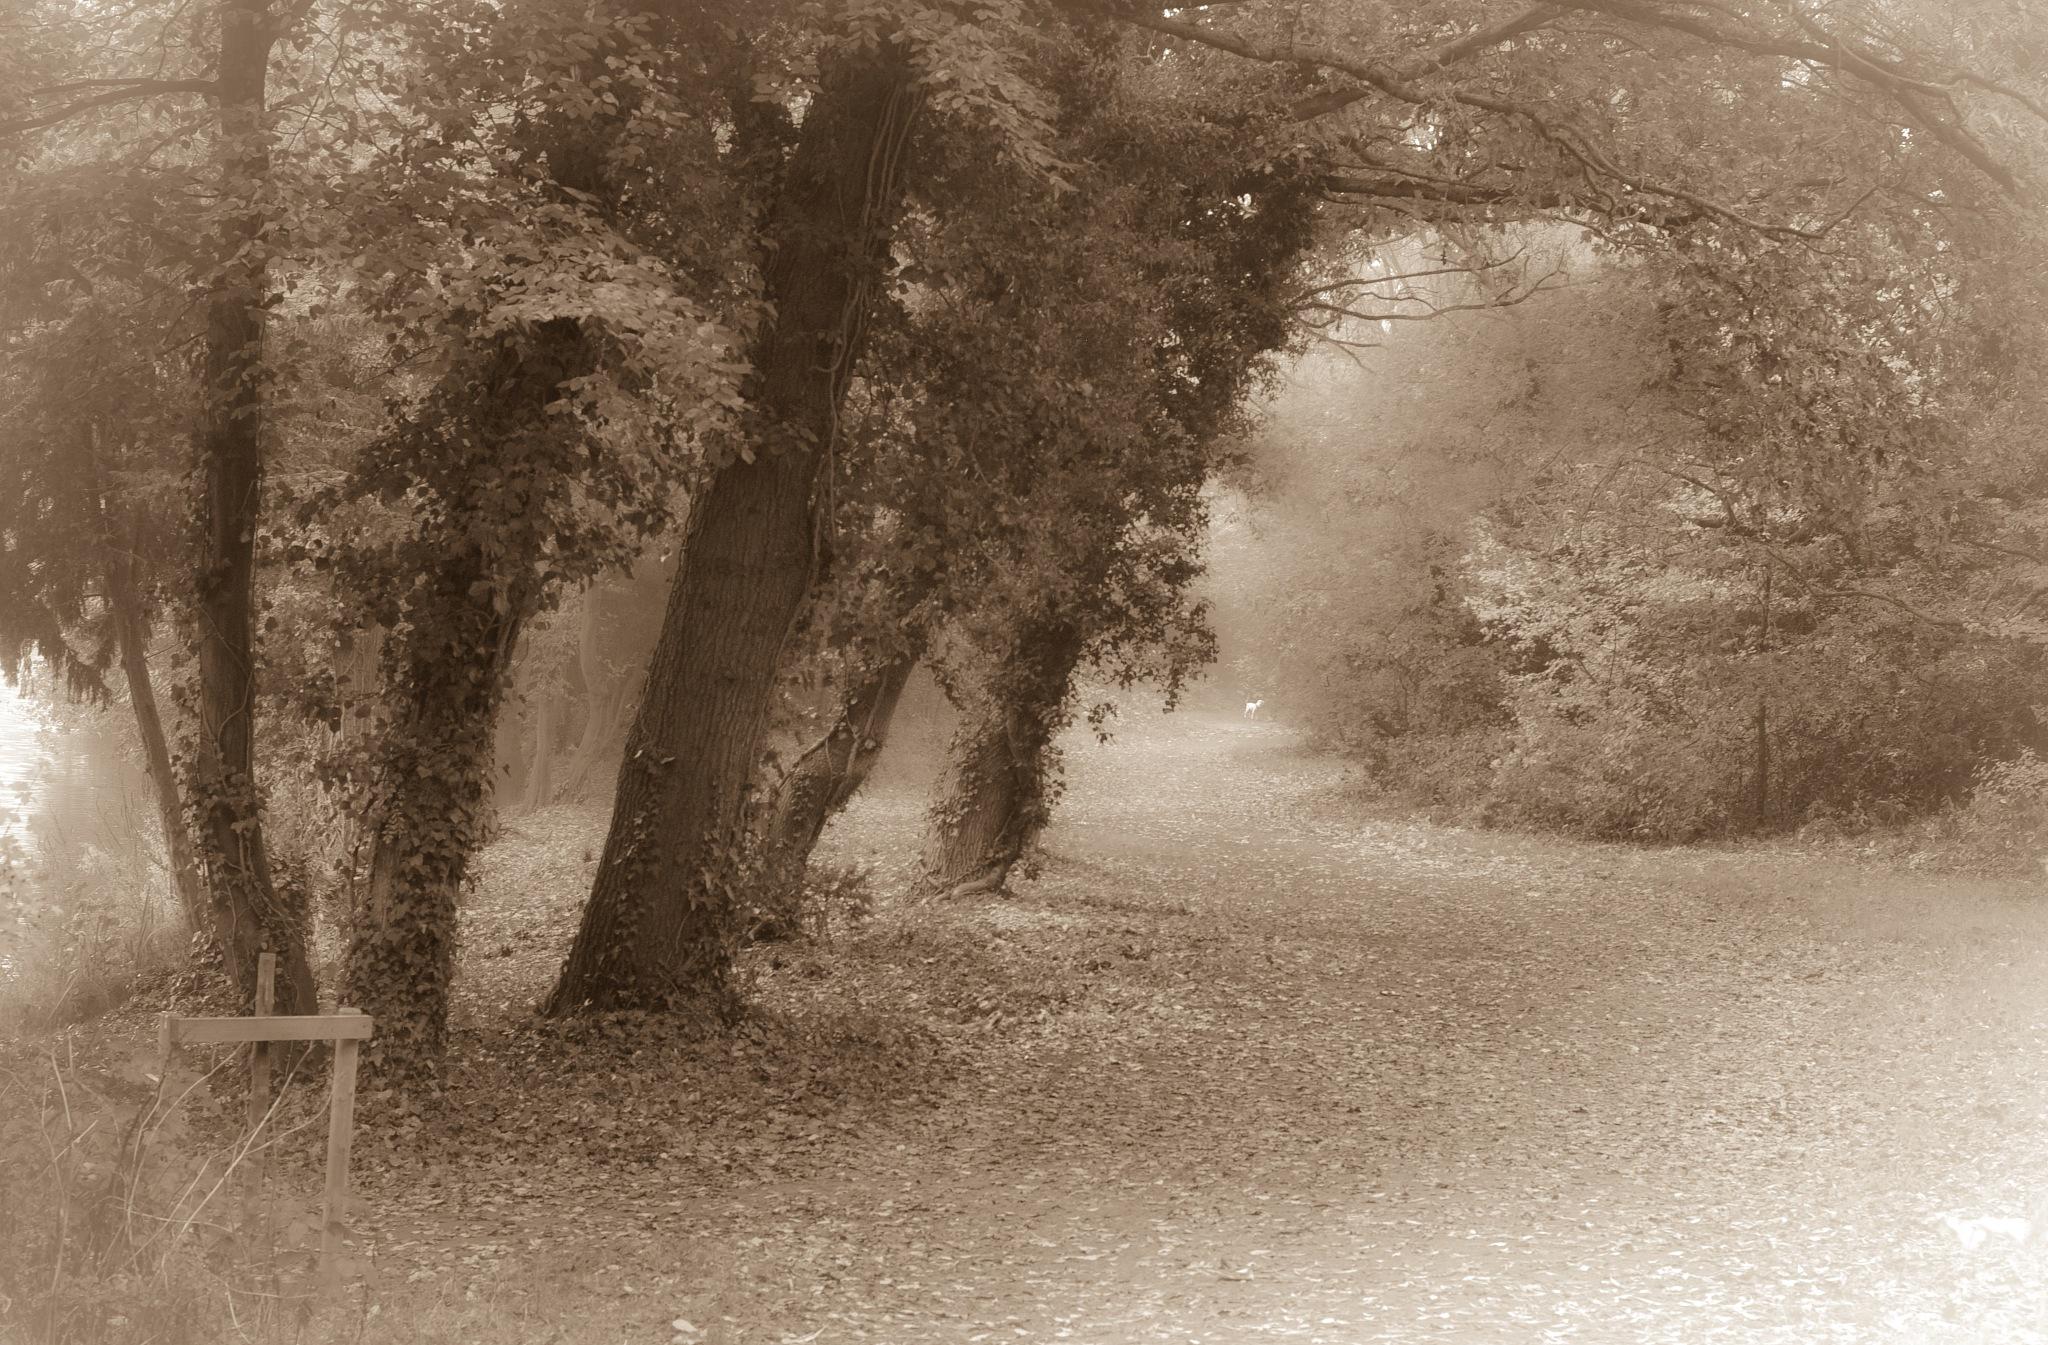 Autumn Mist by Bev Laws